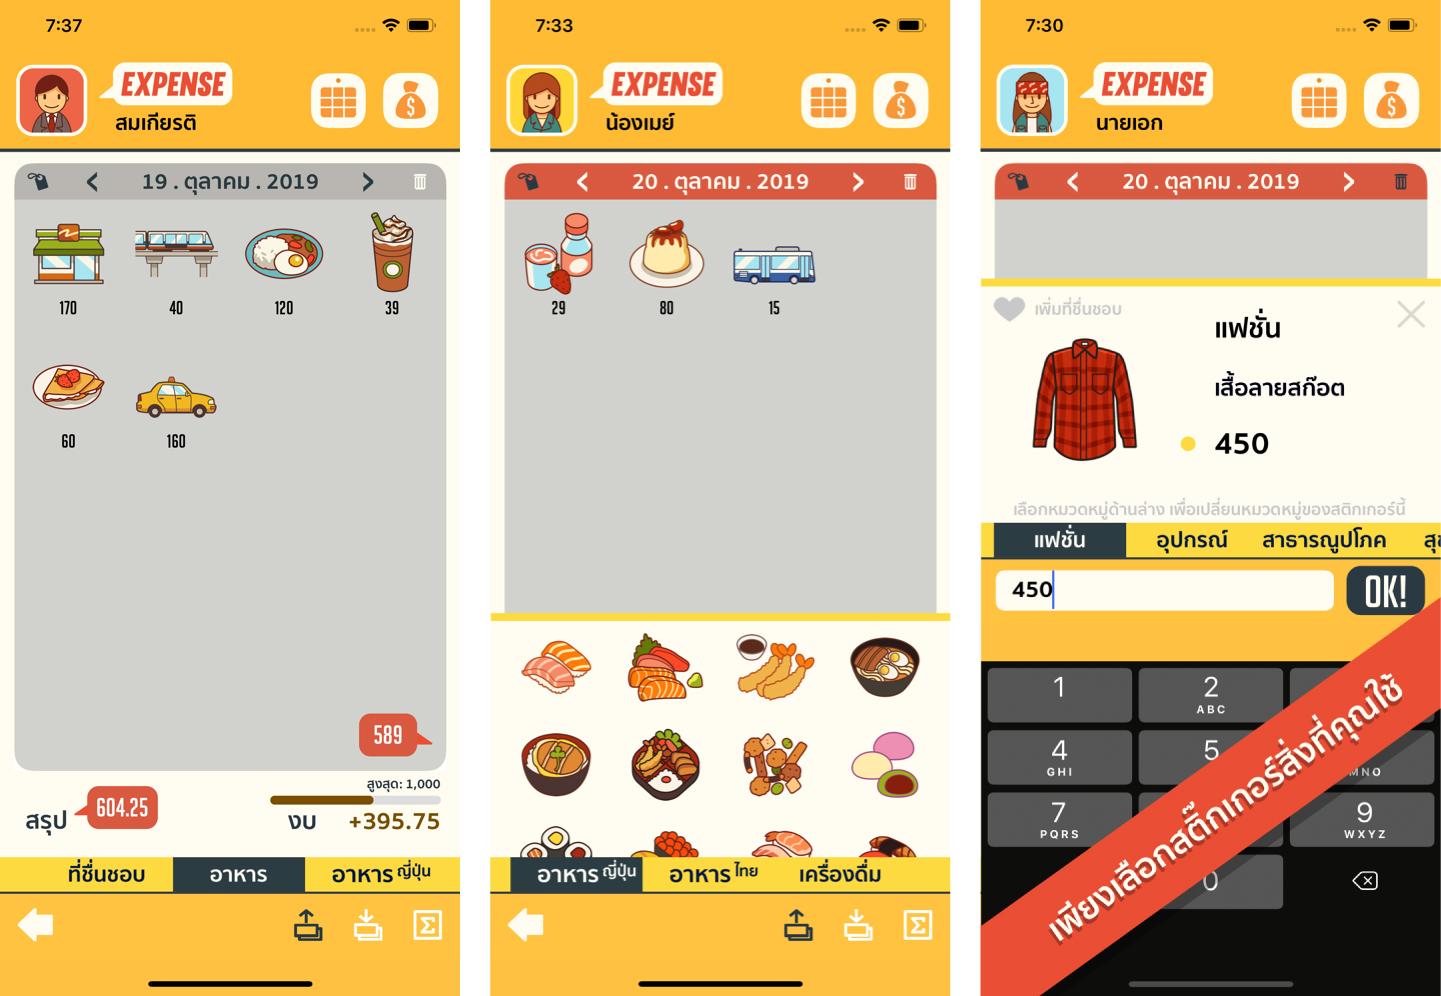 review-5-expense-app-10